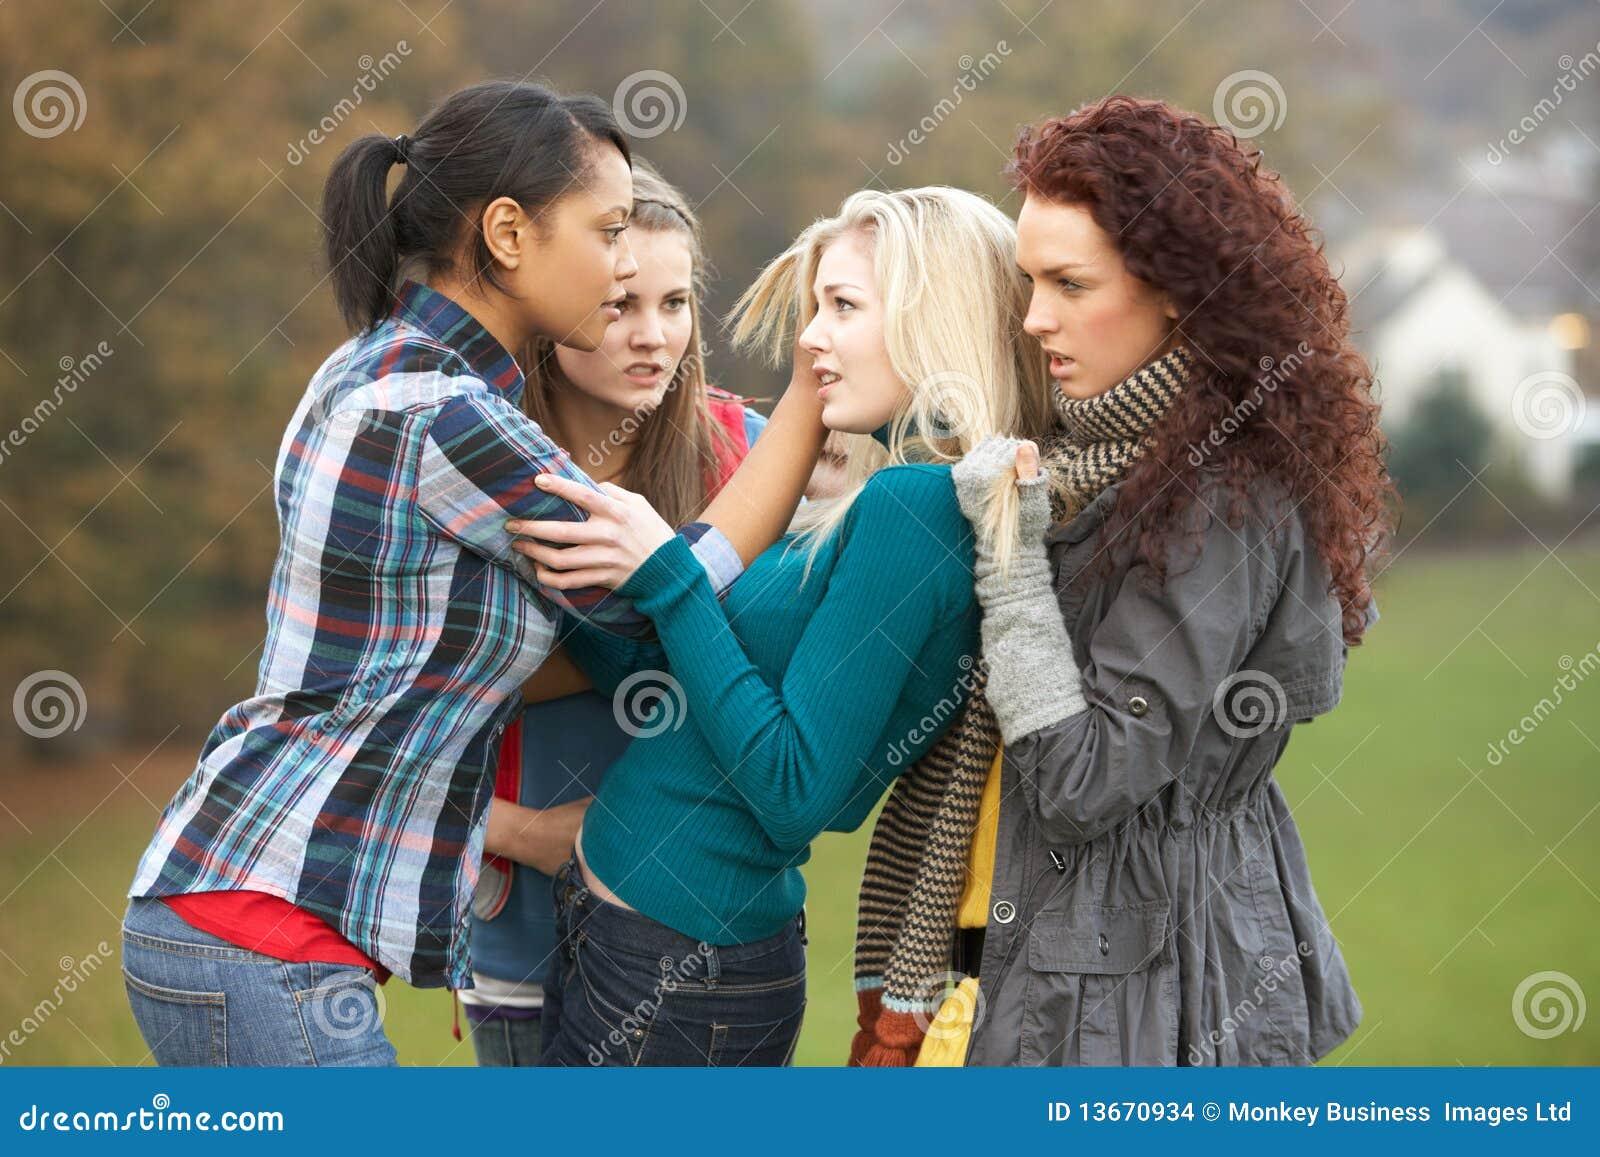 Female bullying